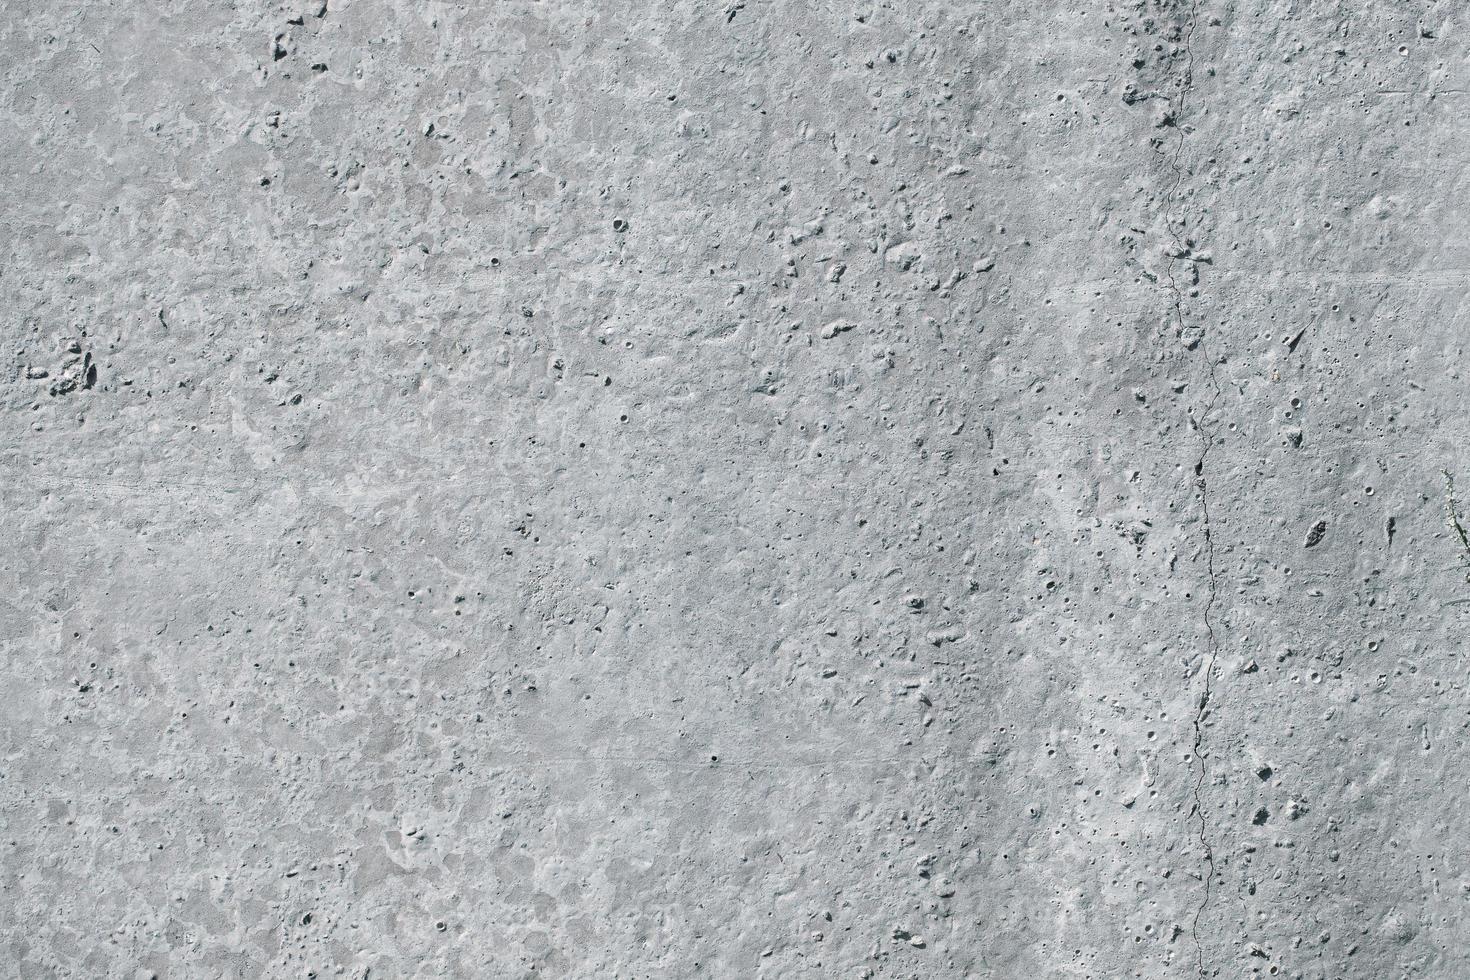 konkrete Materialstruktur foto